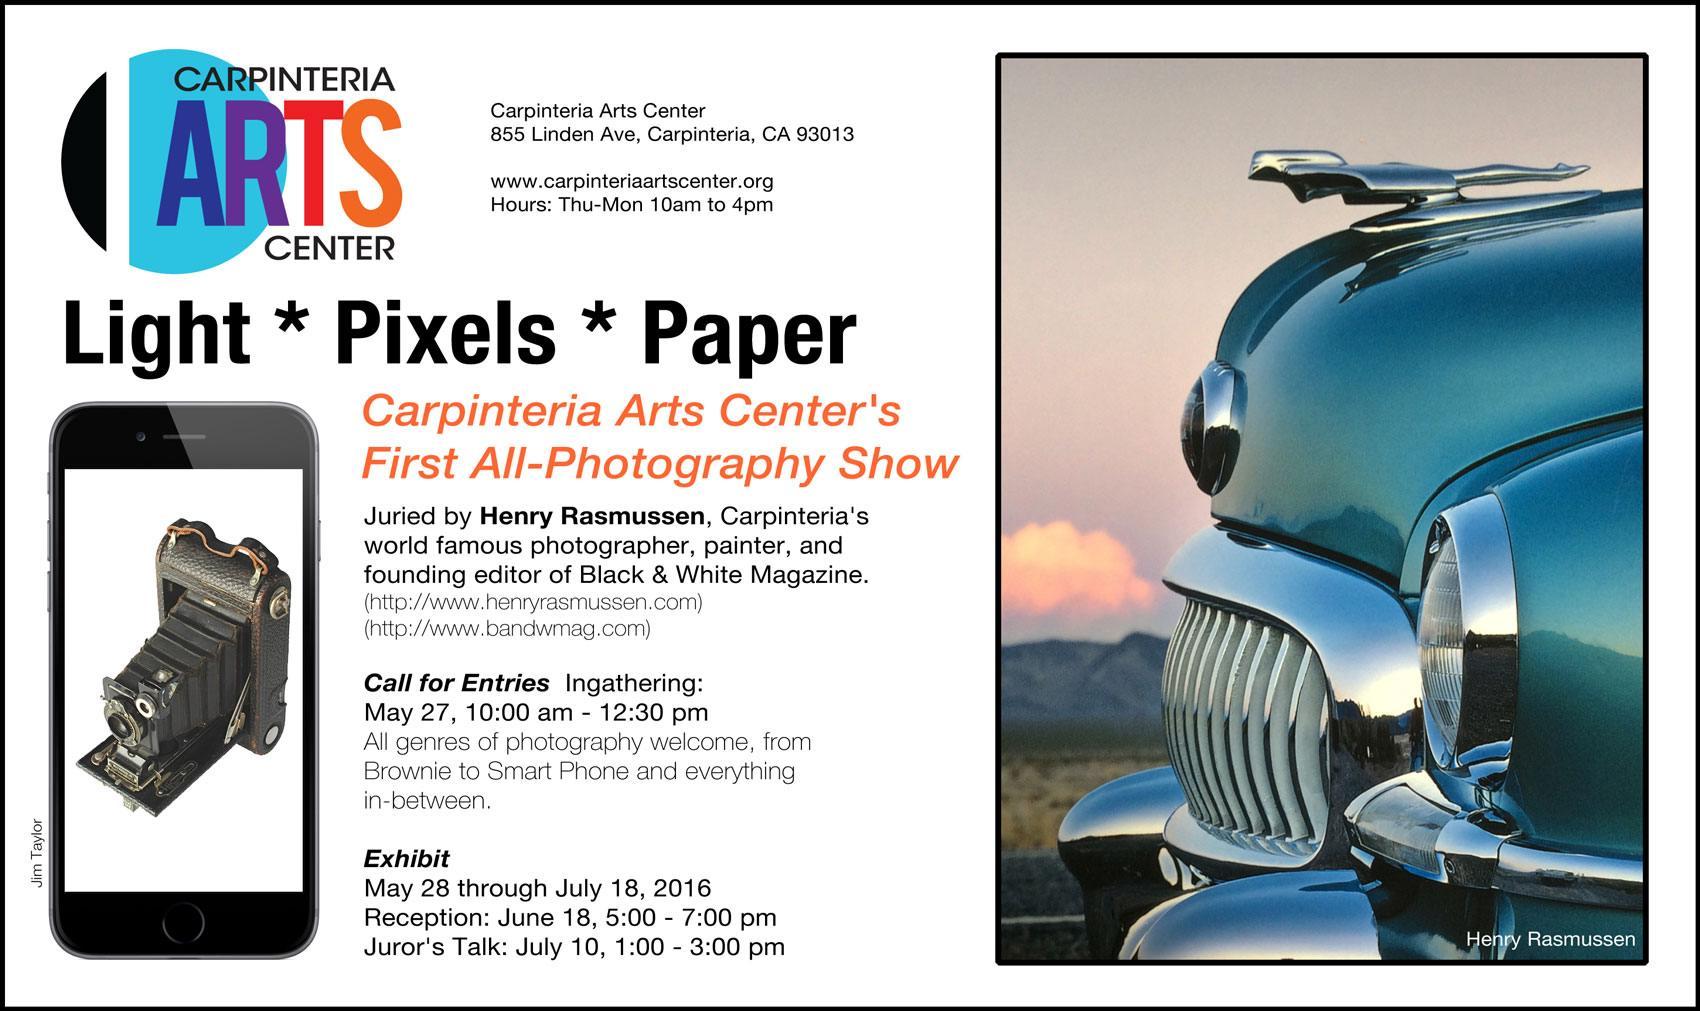 Light. Pixels. Paper - Photographic Exhibit Ingathering